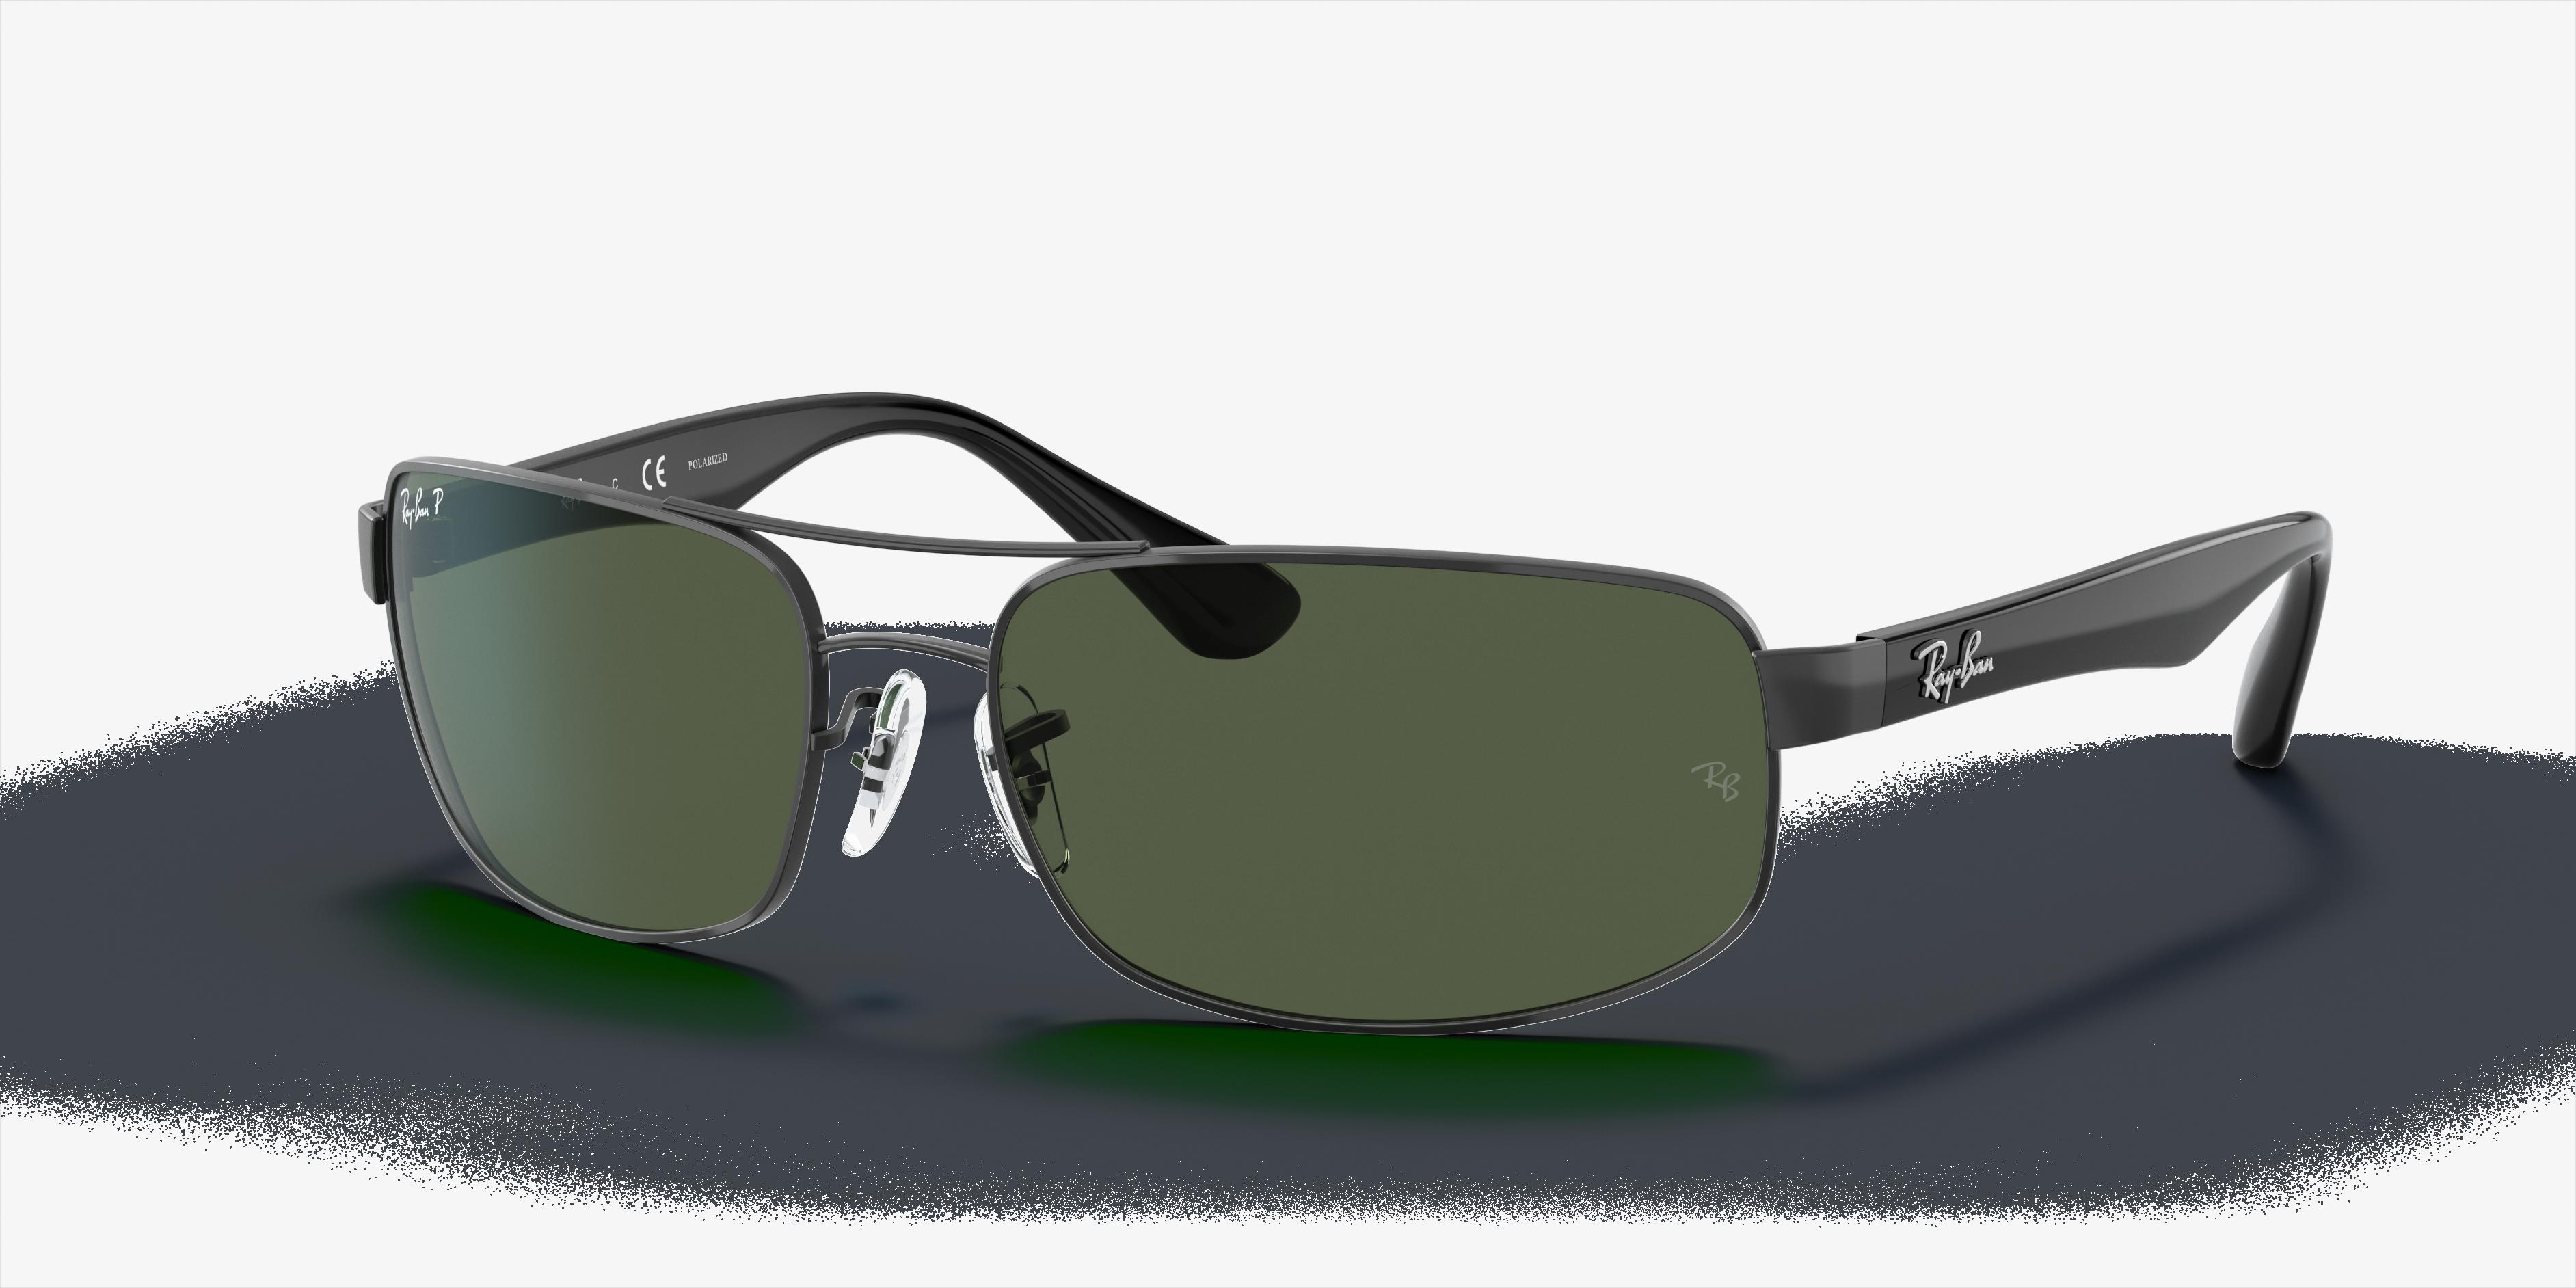 Ray-Ban Rb3445 Black, Polarized Green Lenses - RB3445